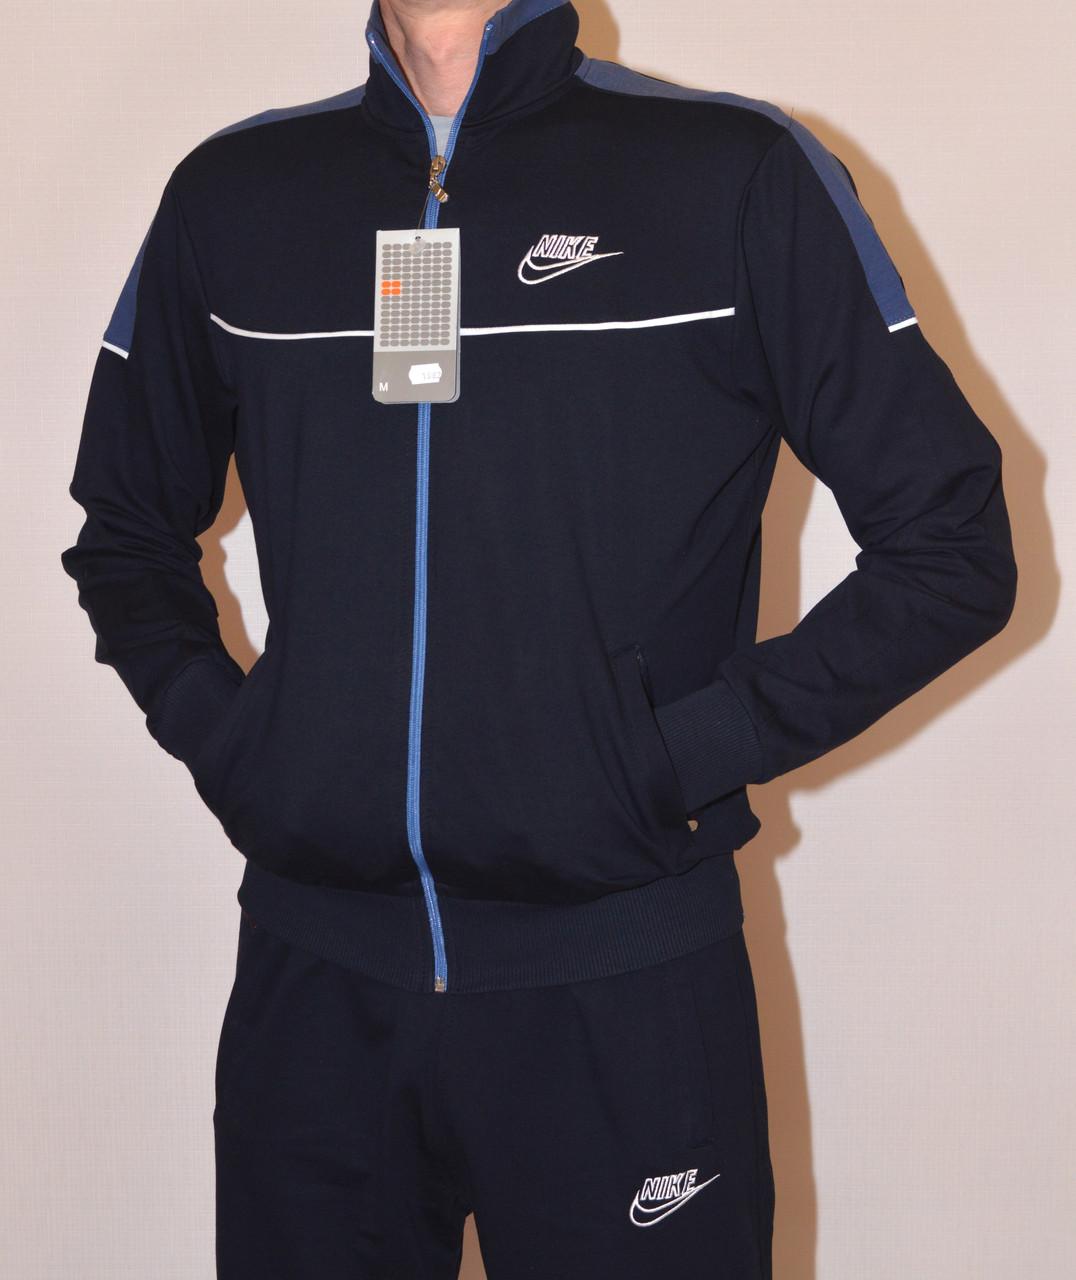 Nike спортивный костюм мужской|1582 (M) (копия)